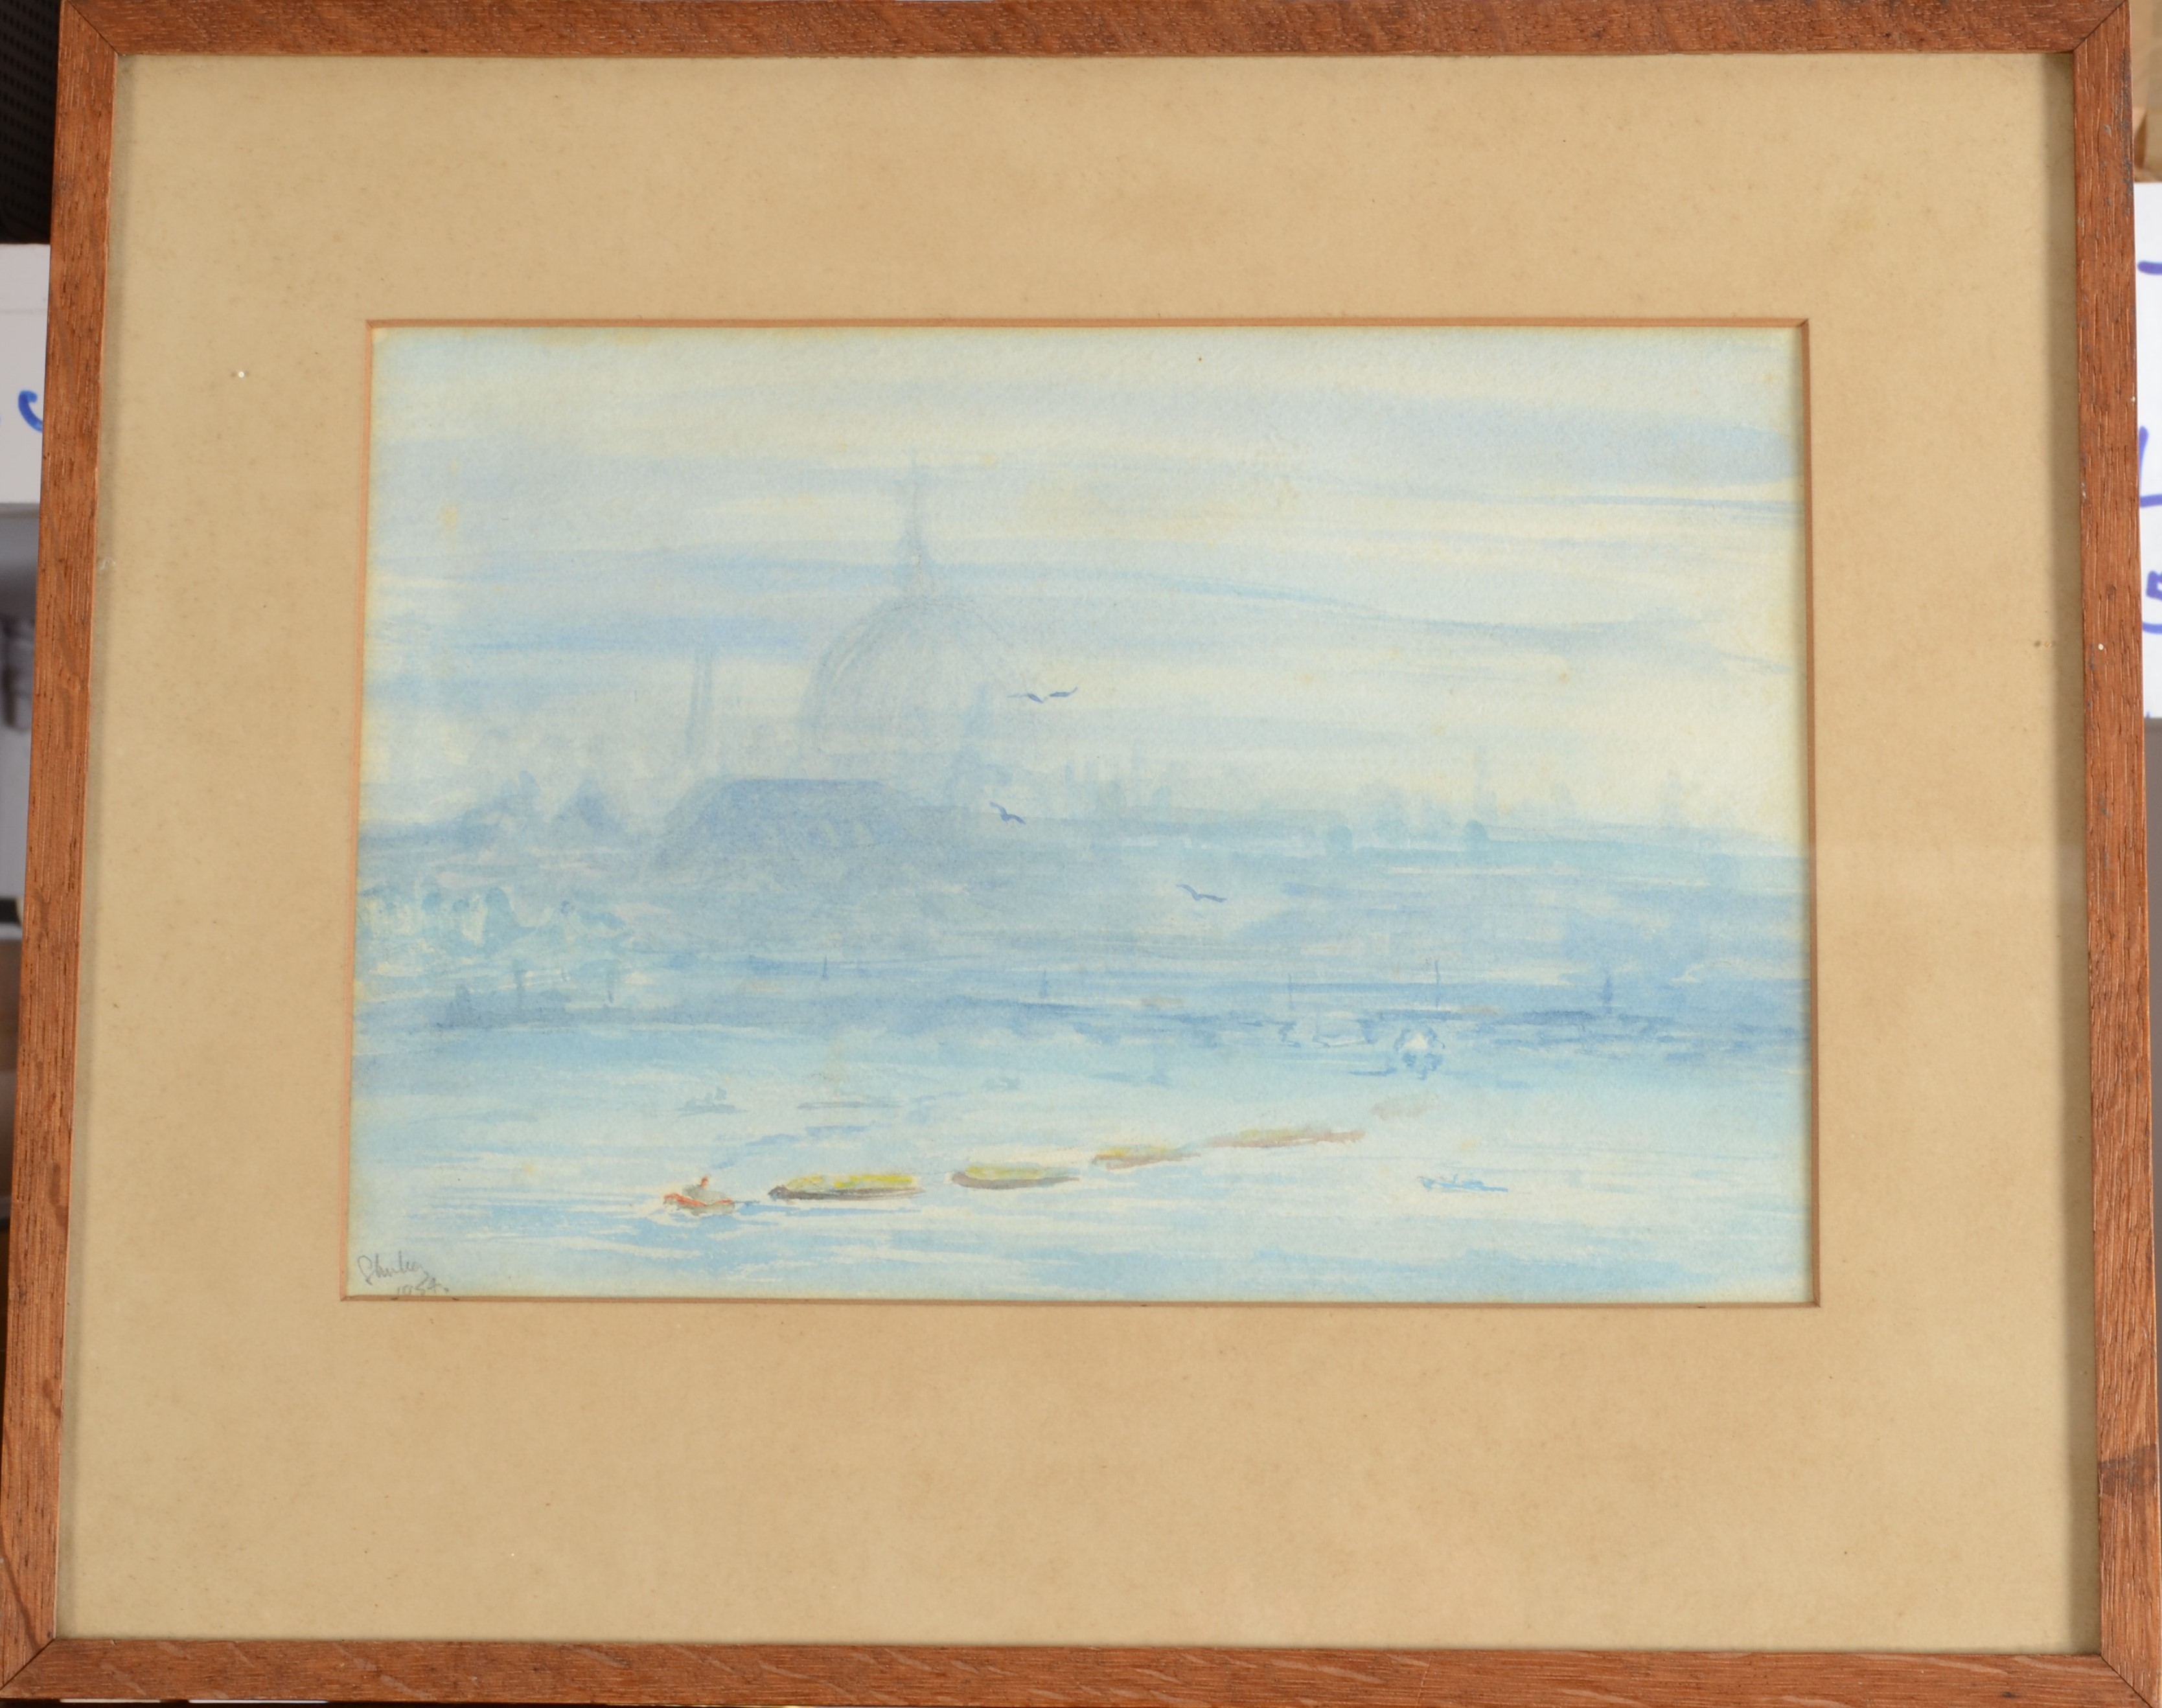 Lot 36 - J I BRERETON Truro from Treyew Watercolour Signed,